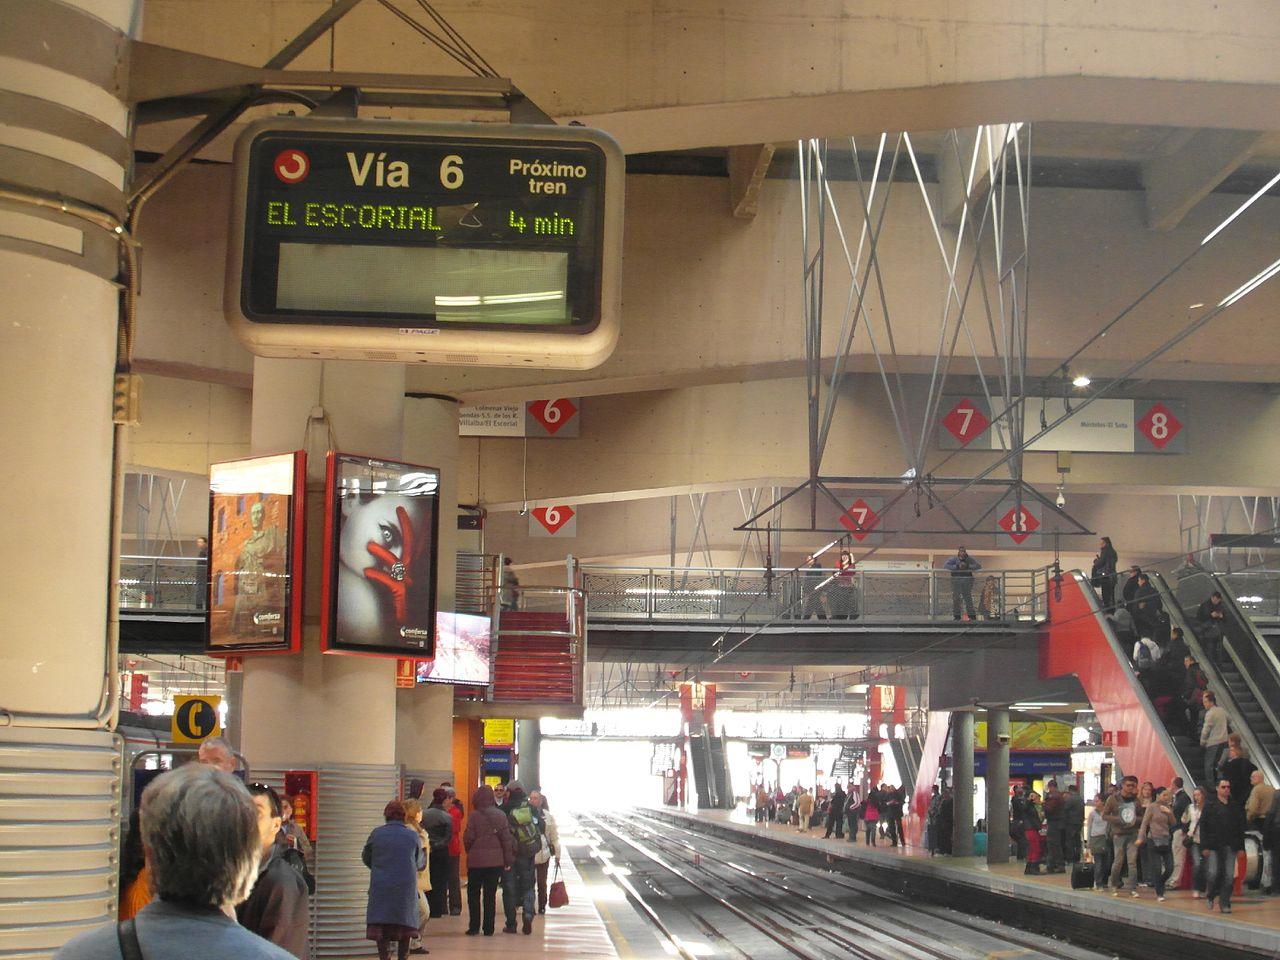 Вокзал Аточа, платформа